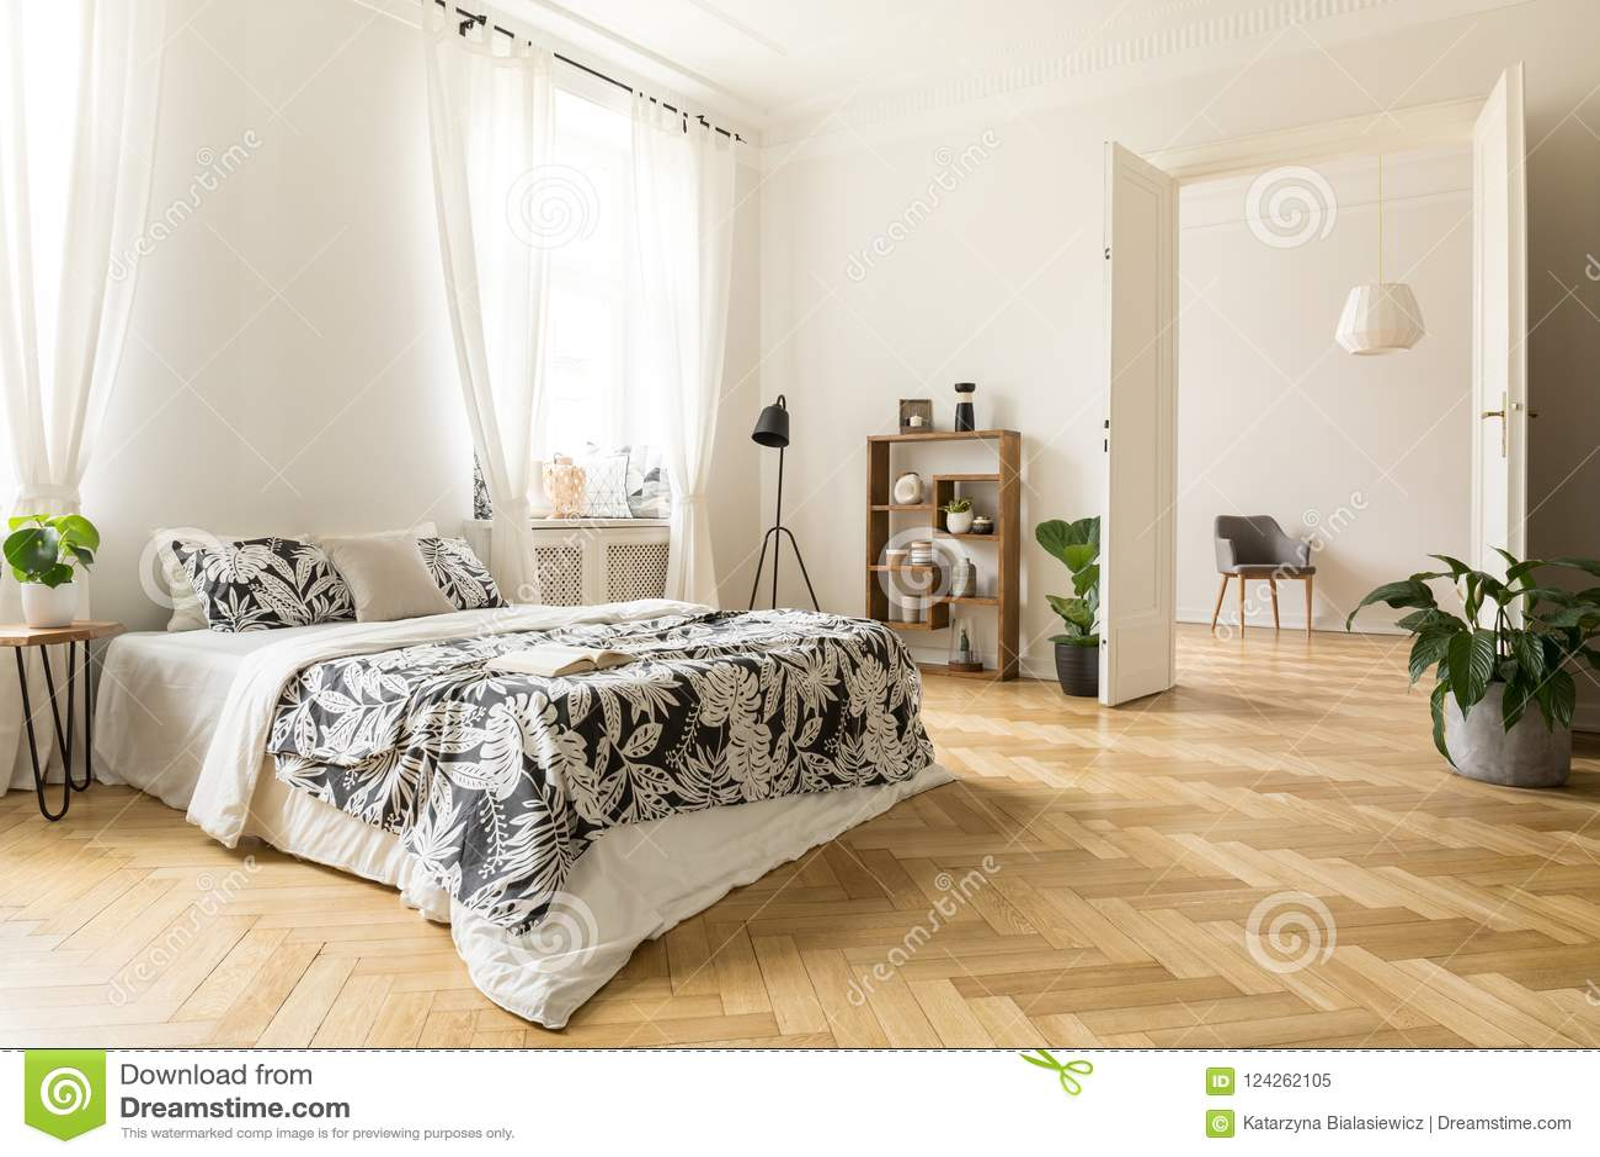 Stylish Apartment Interior With White Walls And Herringbone Wood ...